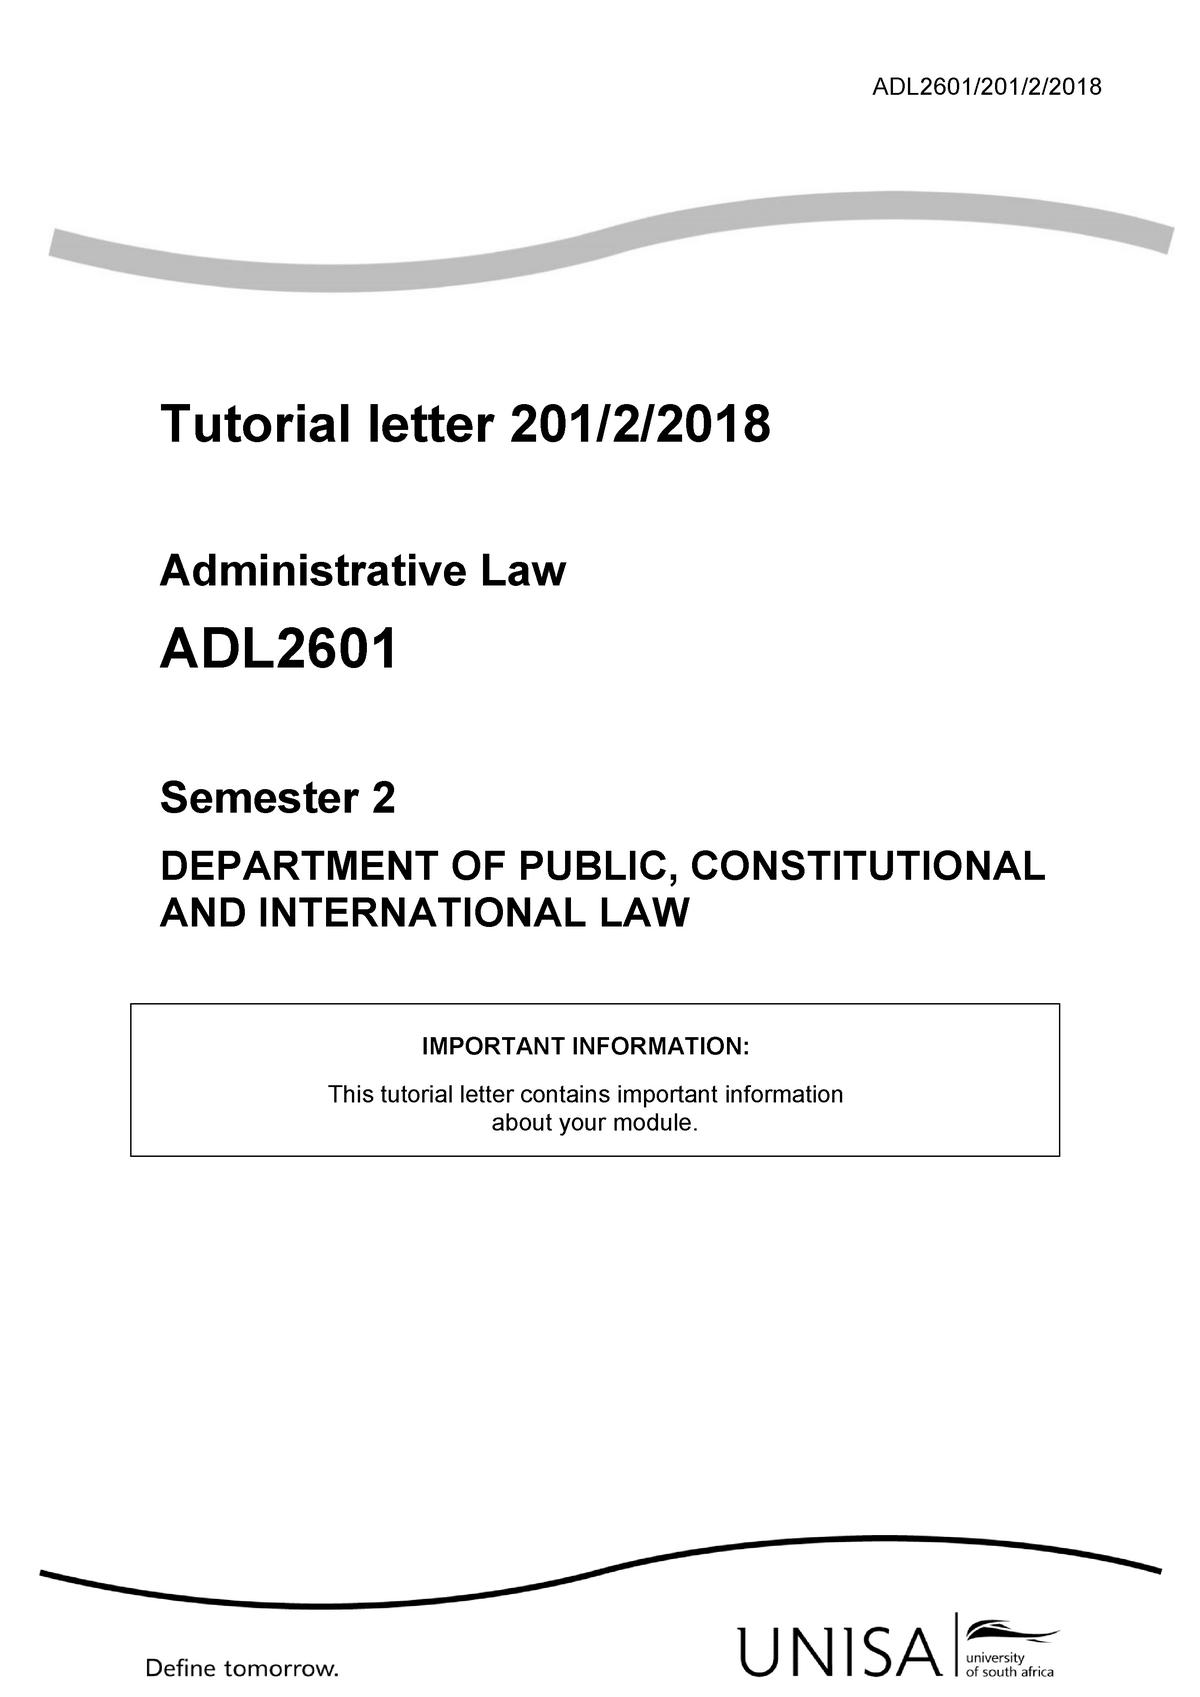 201 2018 2 b - tut - Administrative Law ADL2601 - UNISA